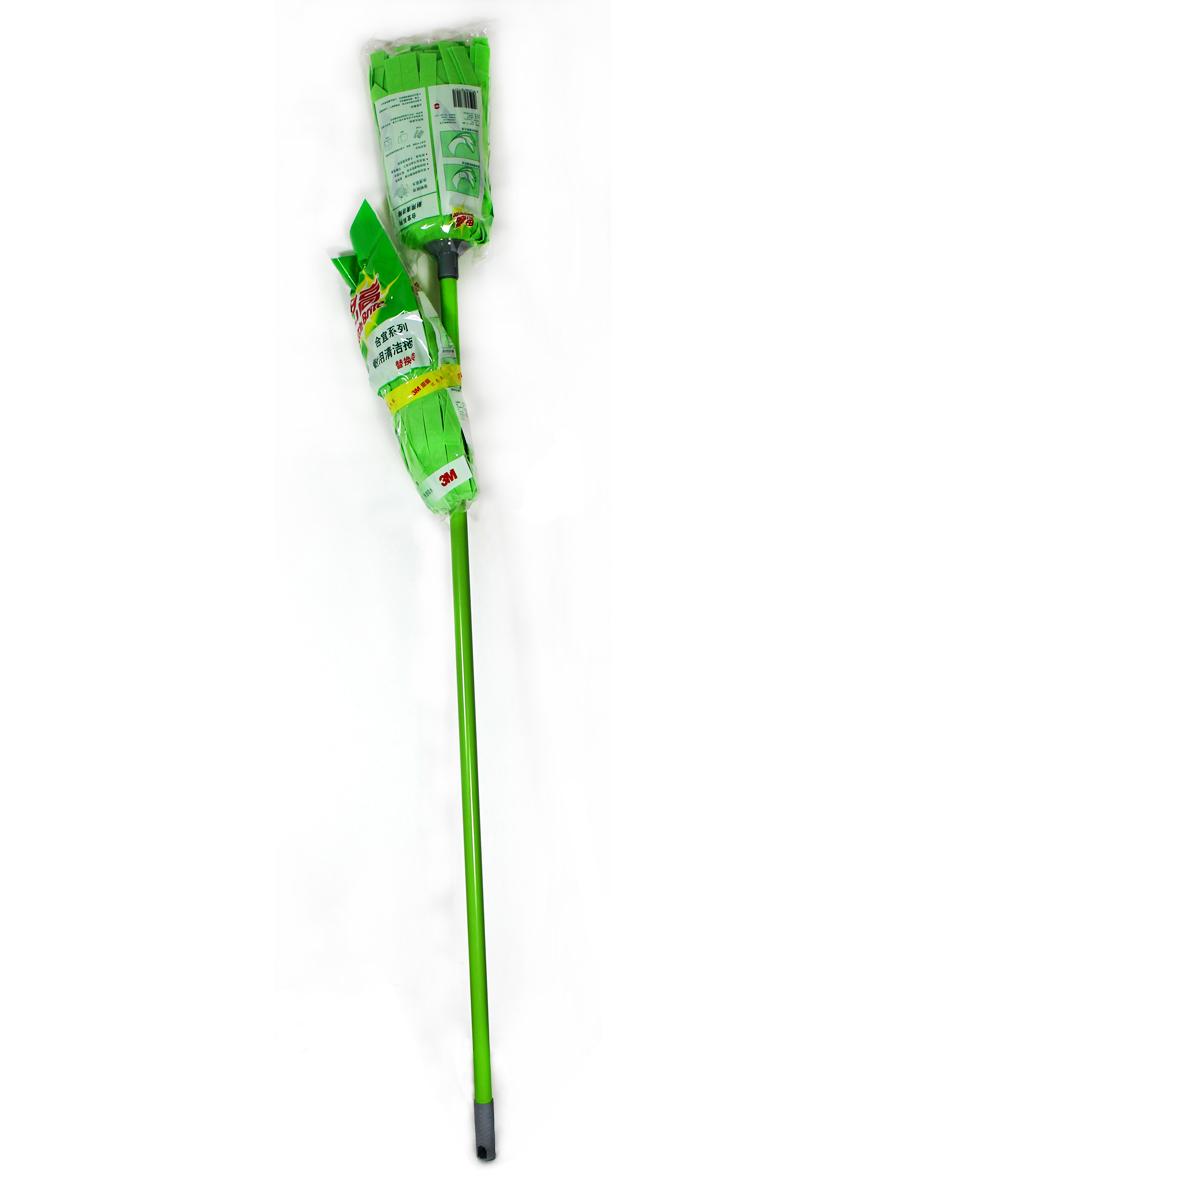 3m scotch mop clean series rb1 mop head mop(China (Mainland))